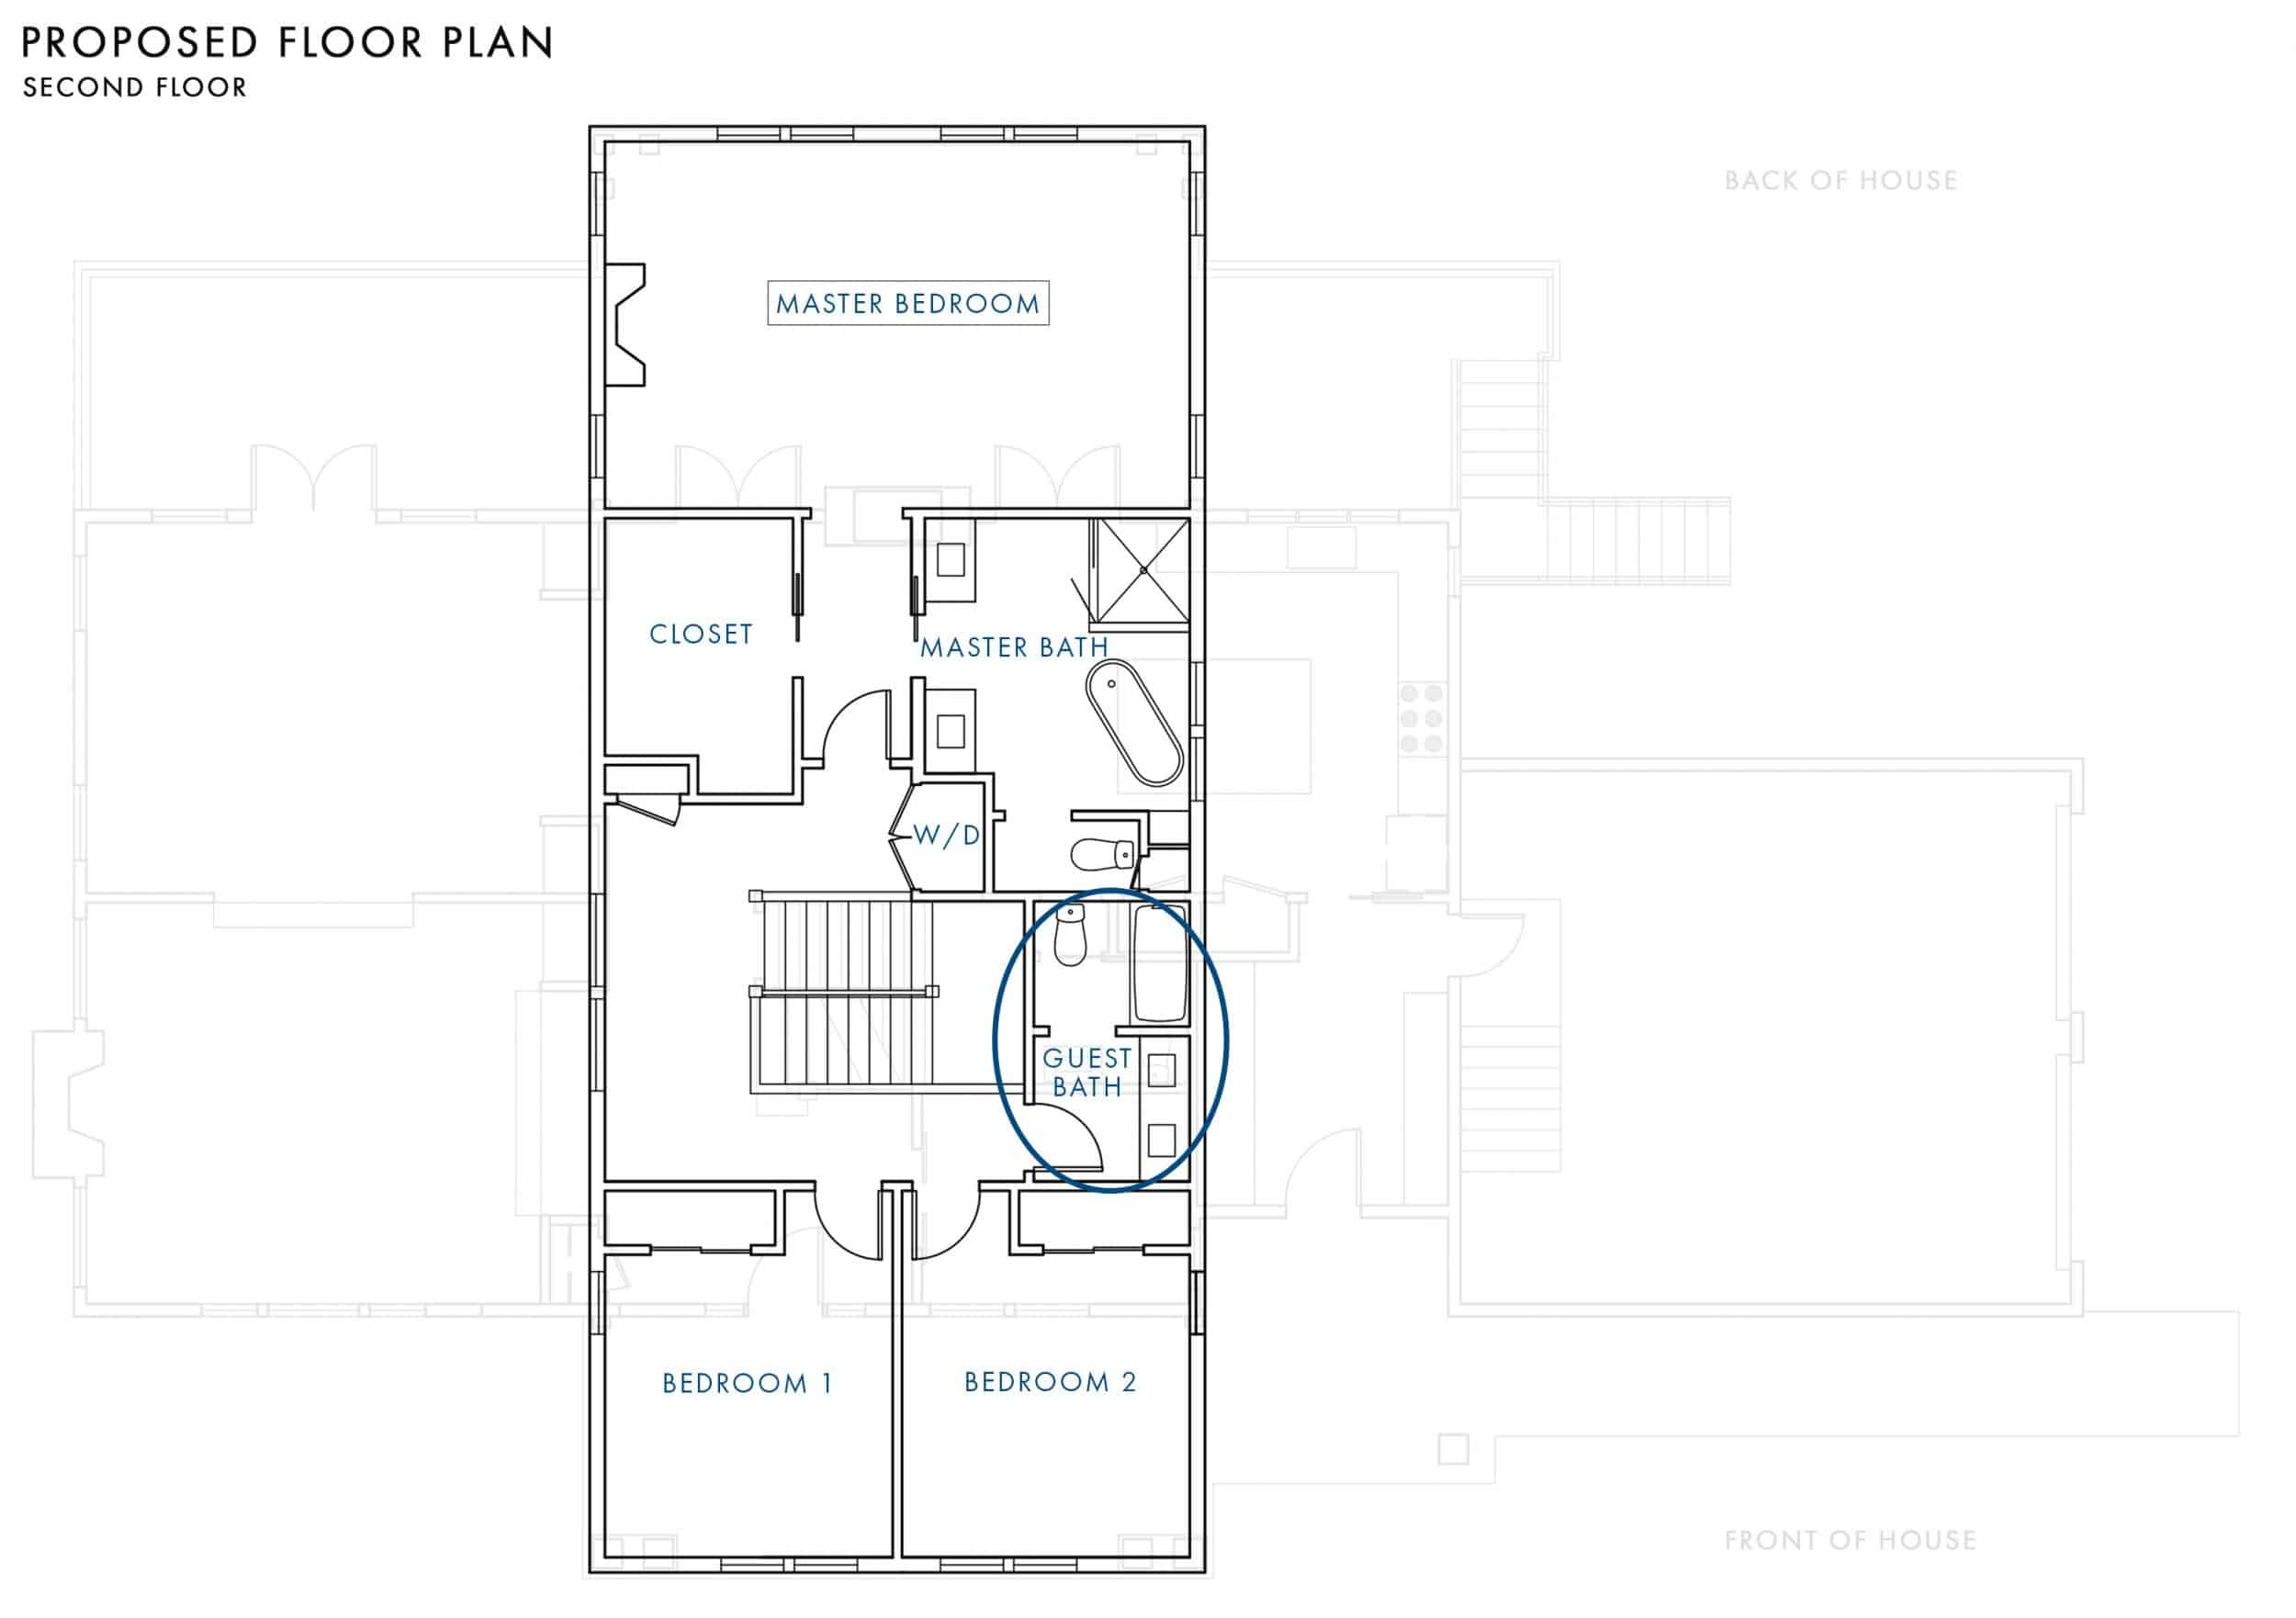 Emily Henderson Portland Fixer Upper Traditional Floor Plans Proposed Plan Second Floor